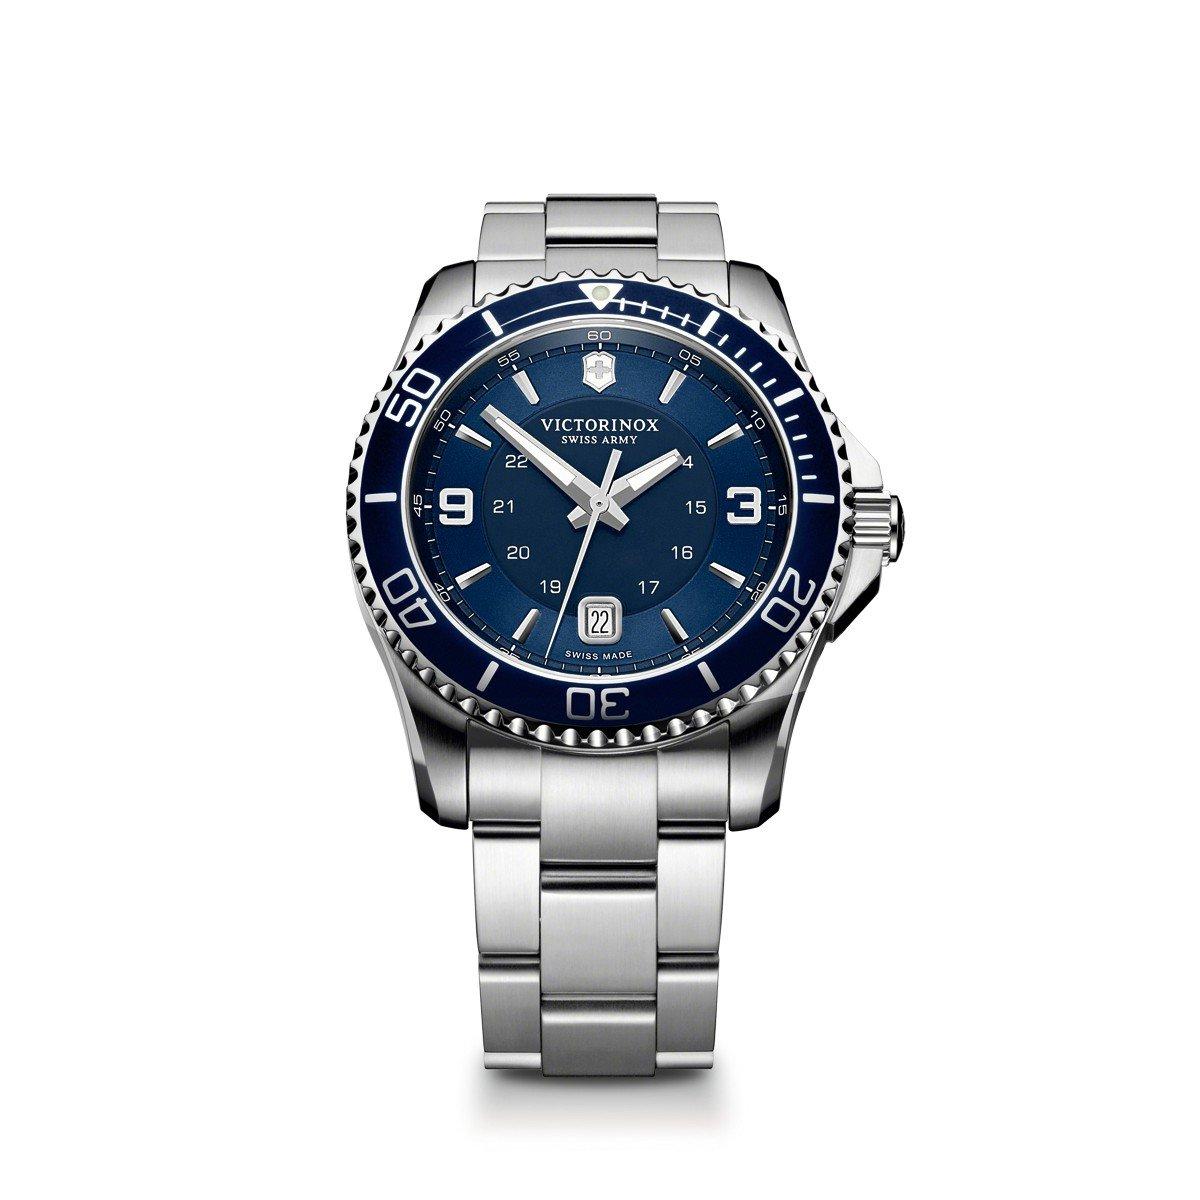 Victorinox Swiss Army Maverick Stainless Steel Watch, 43mm, Black by Victorinox Swiss Army (Image #1)